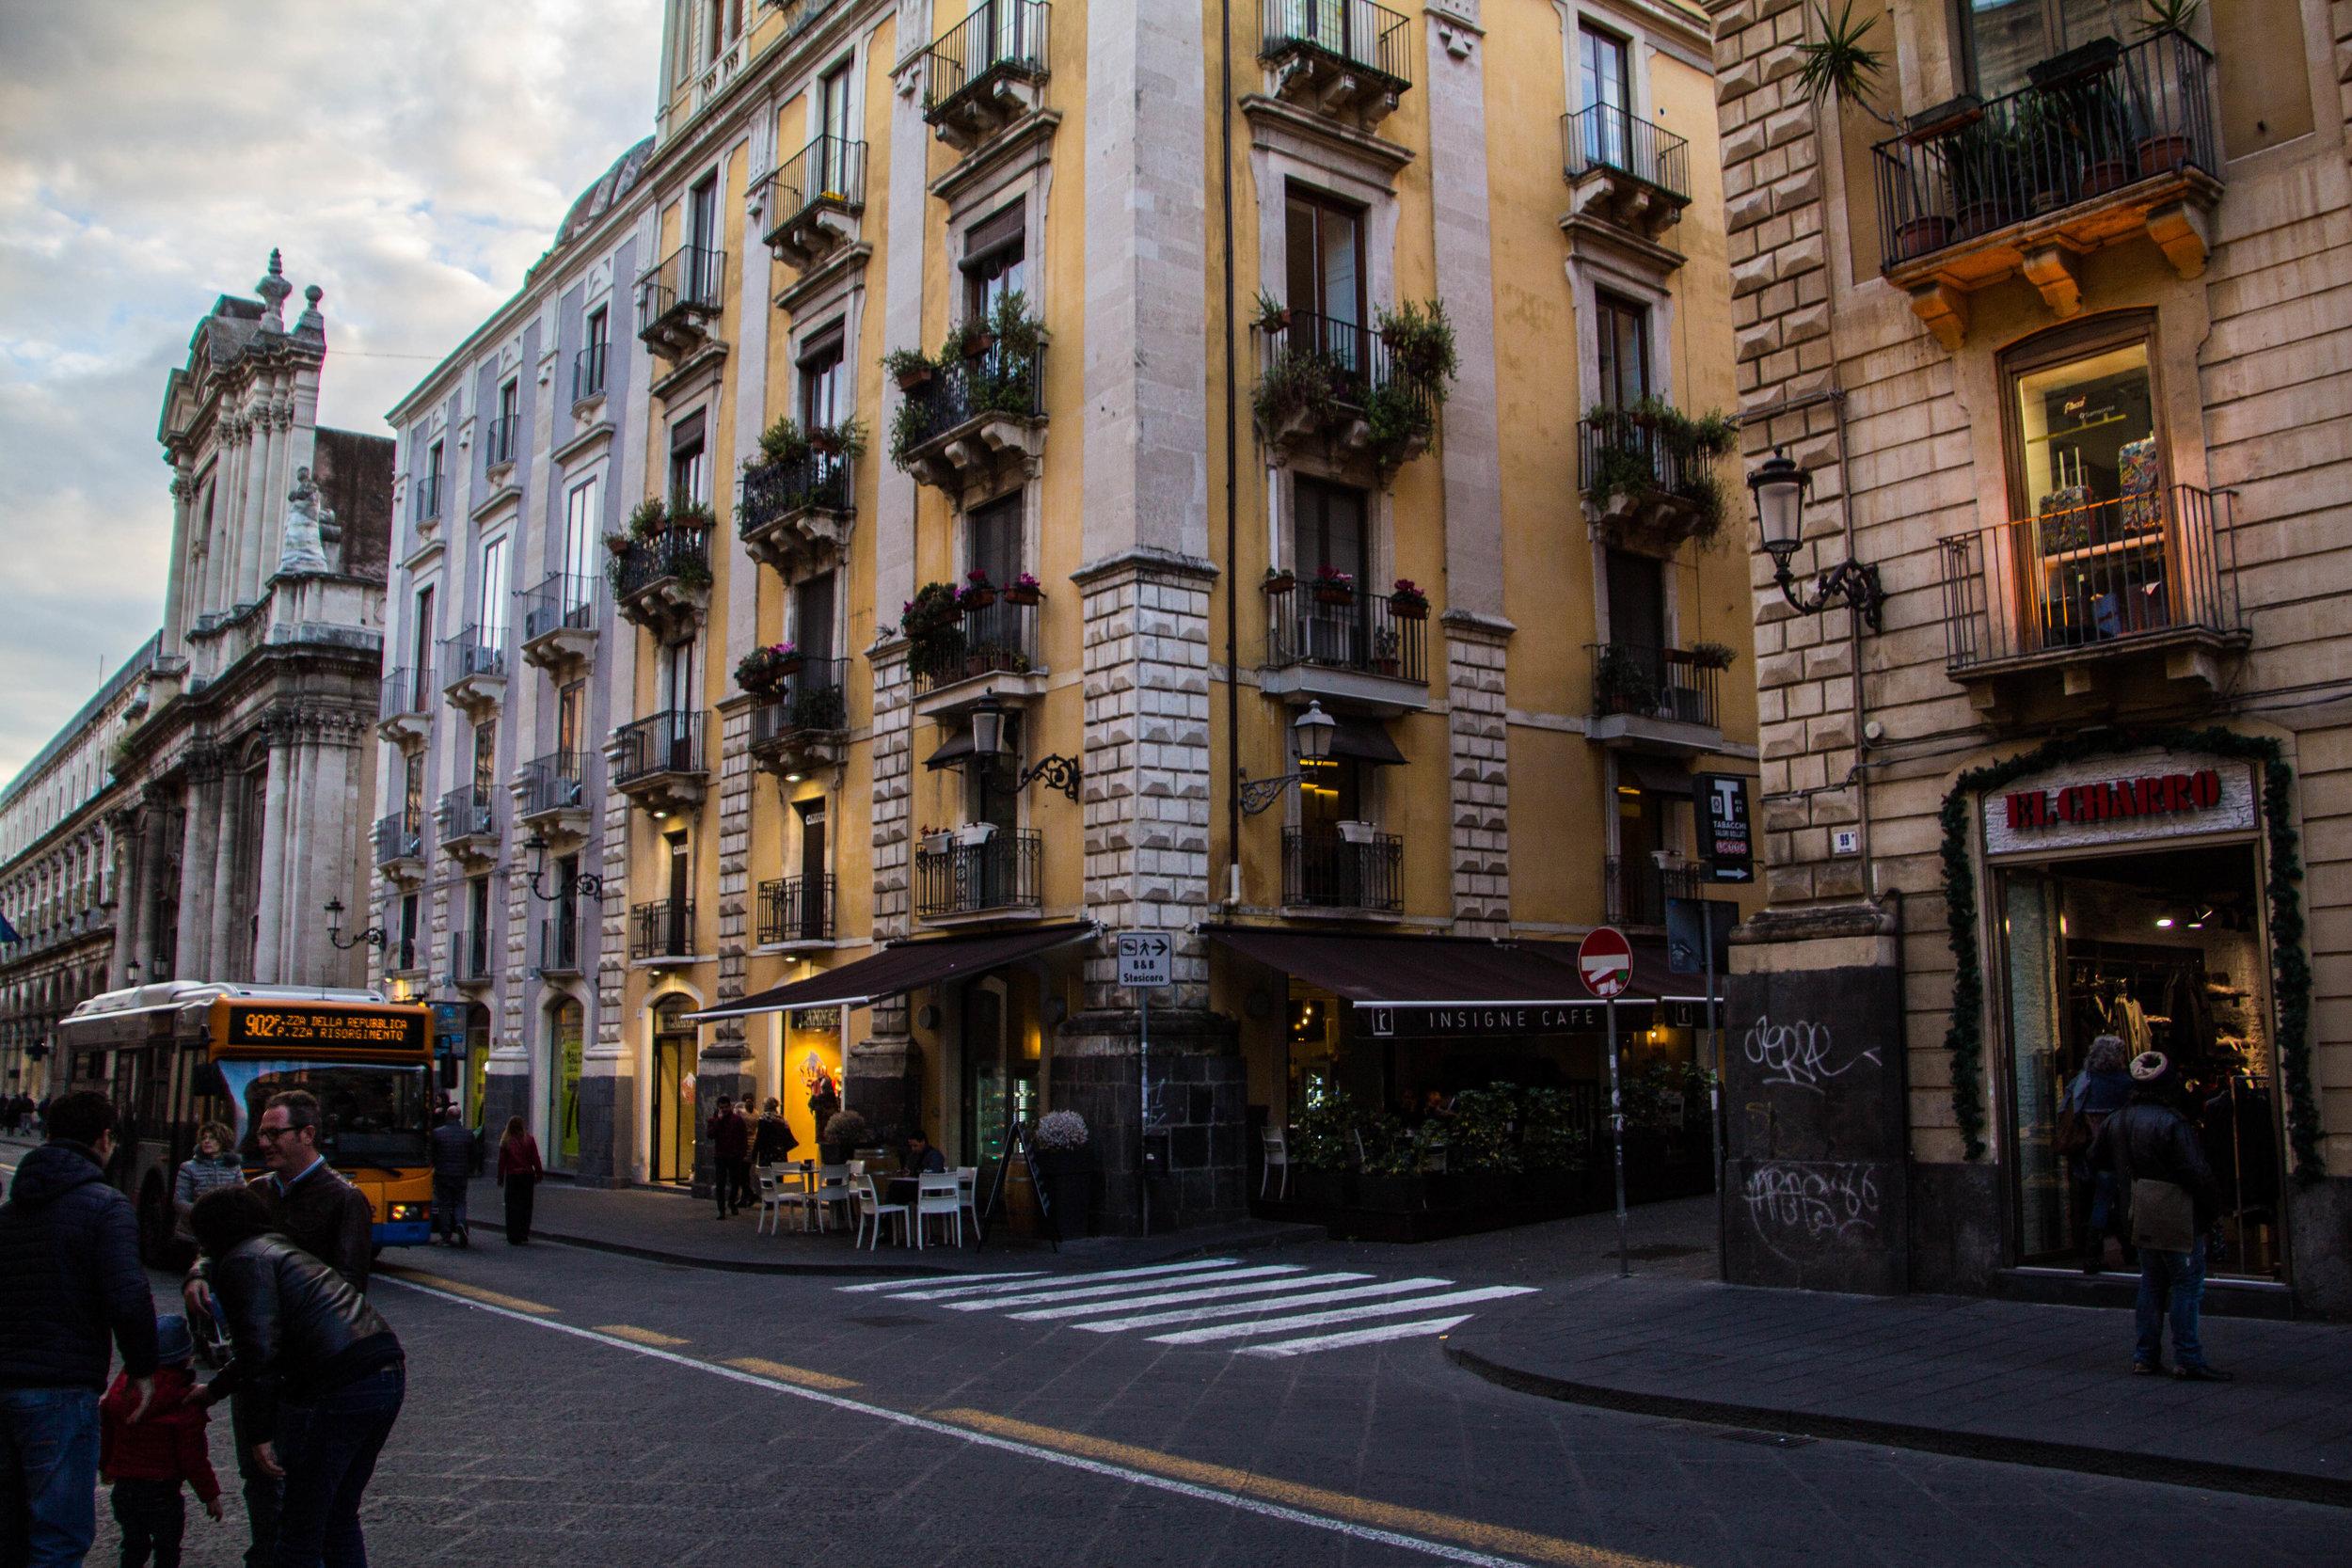 streets-catania-sicily-sicilia-14.jpg